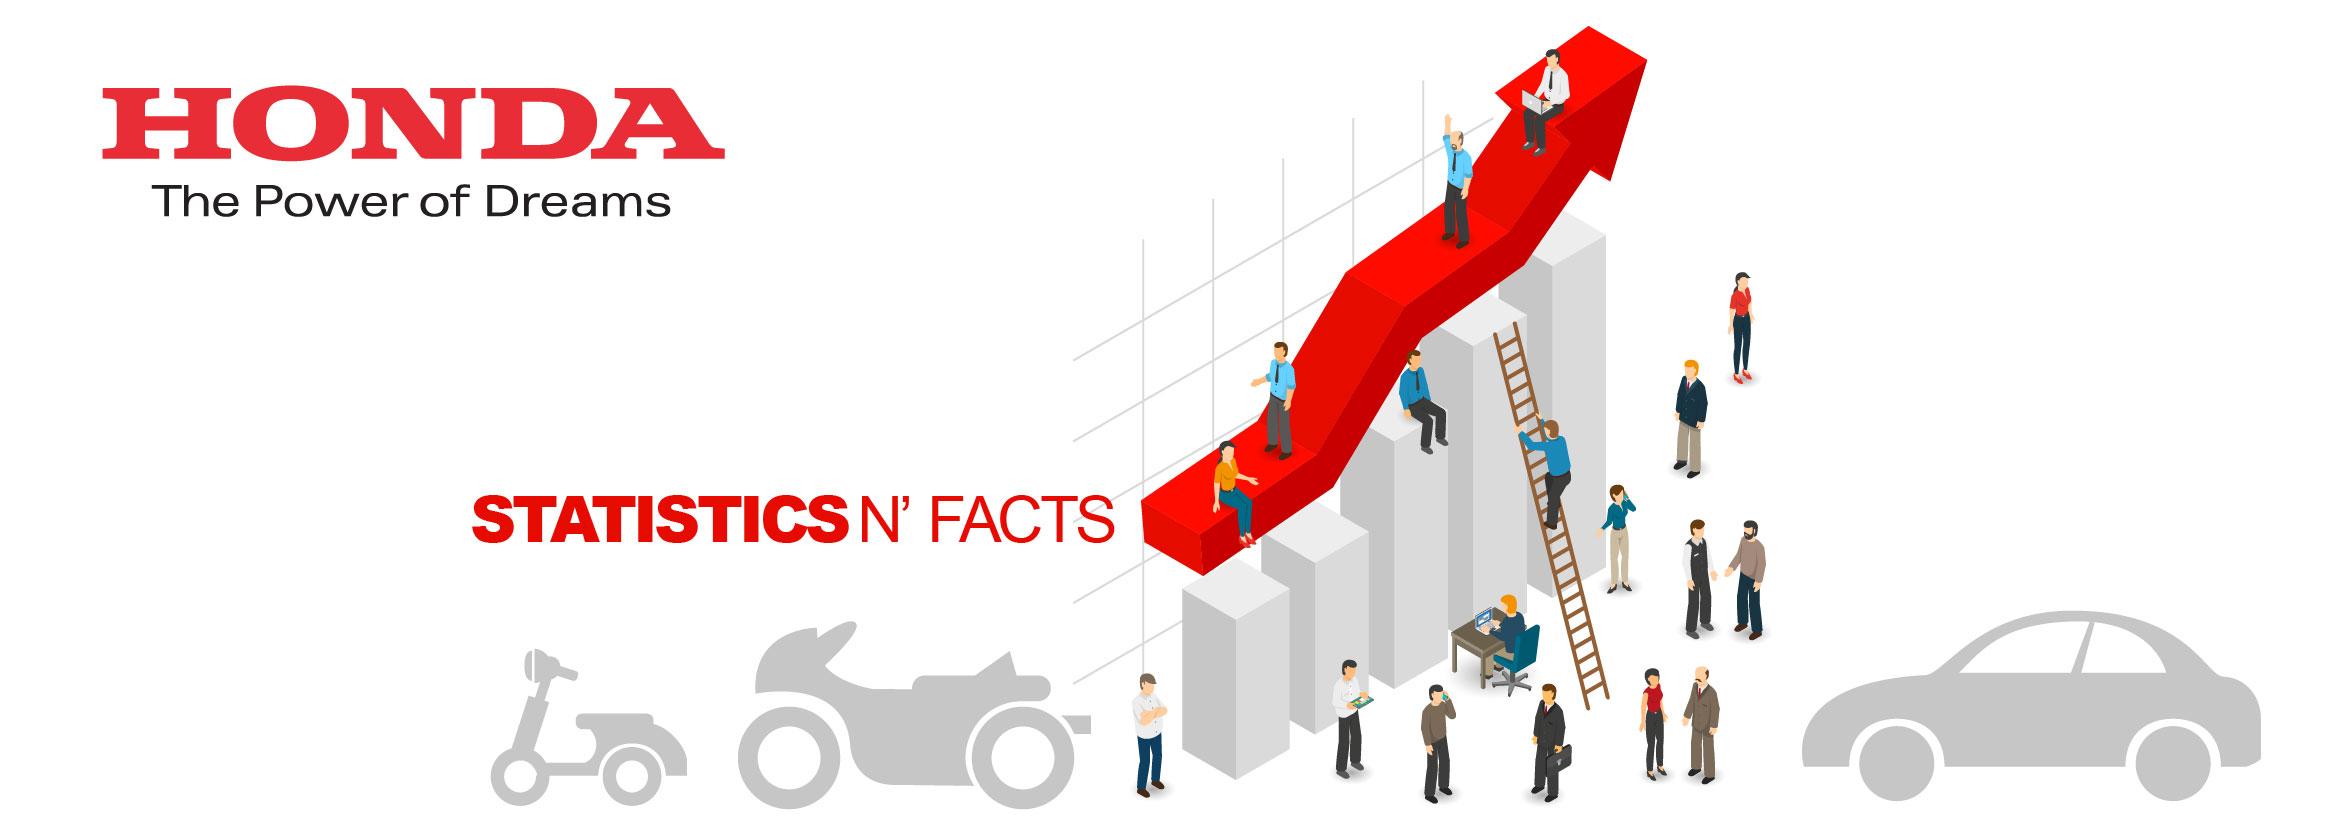 honda statistics and facts